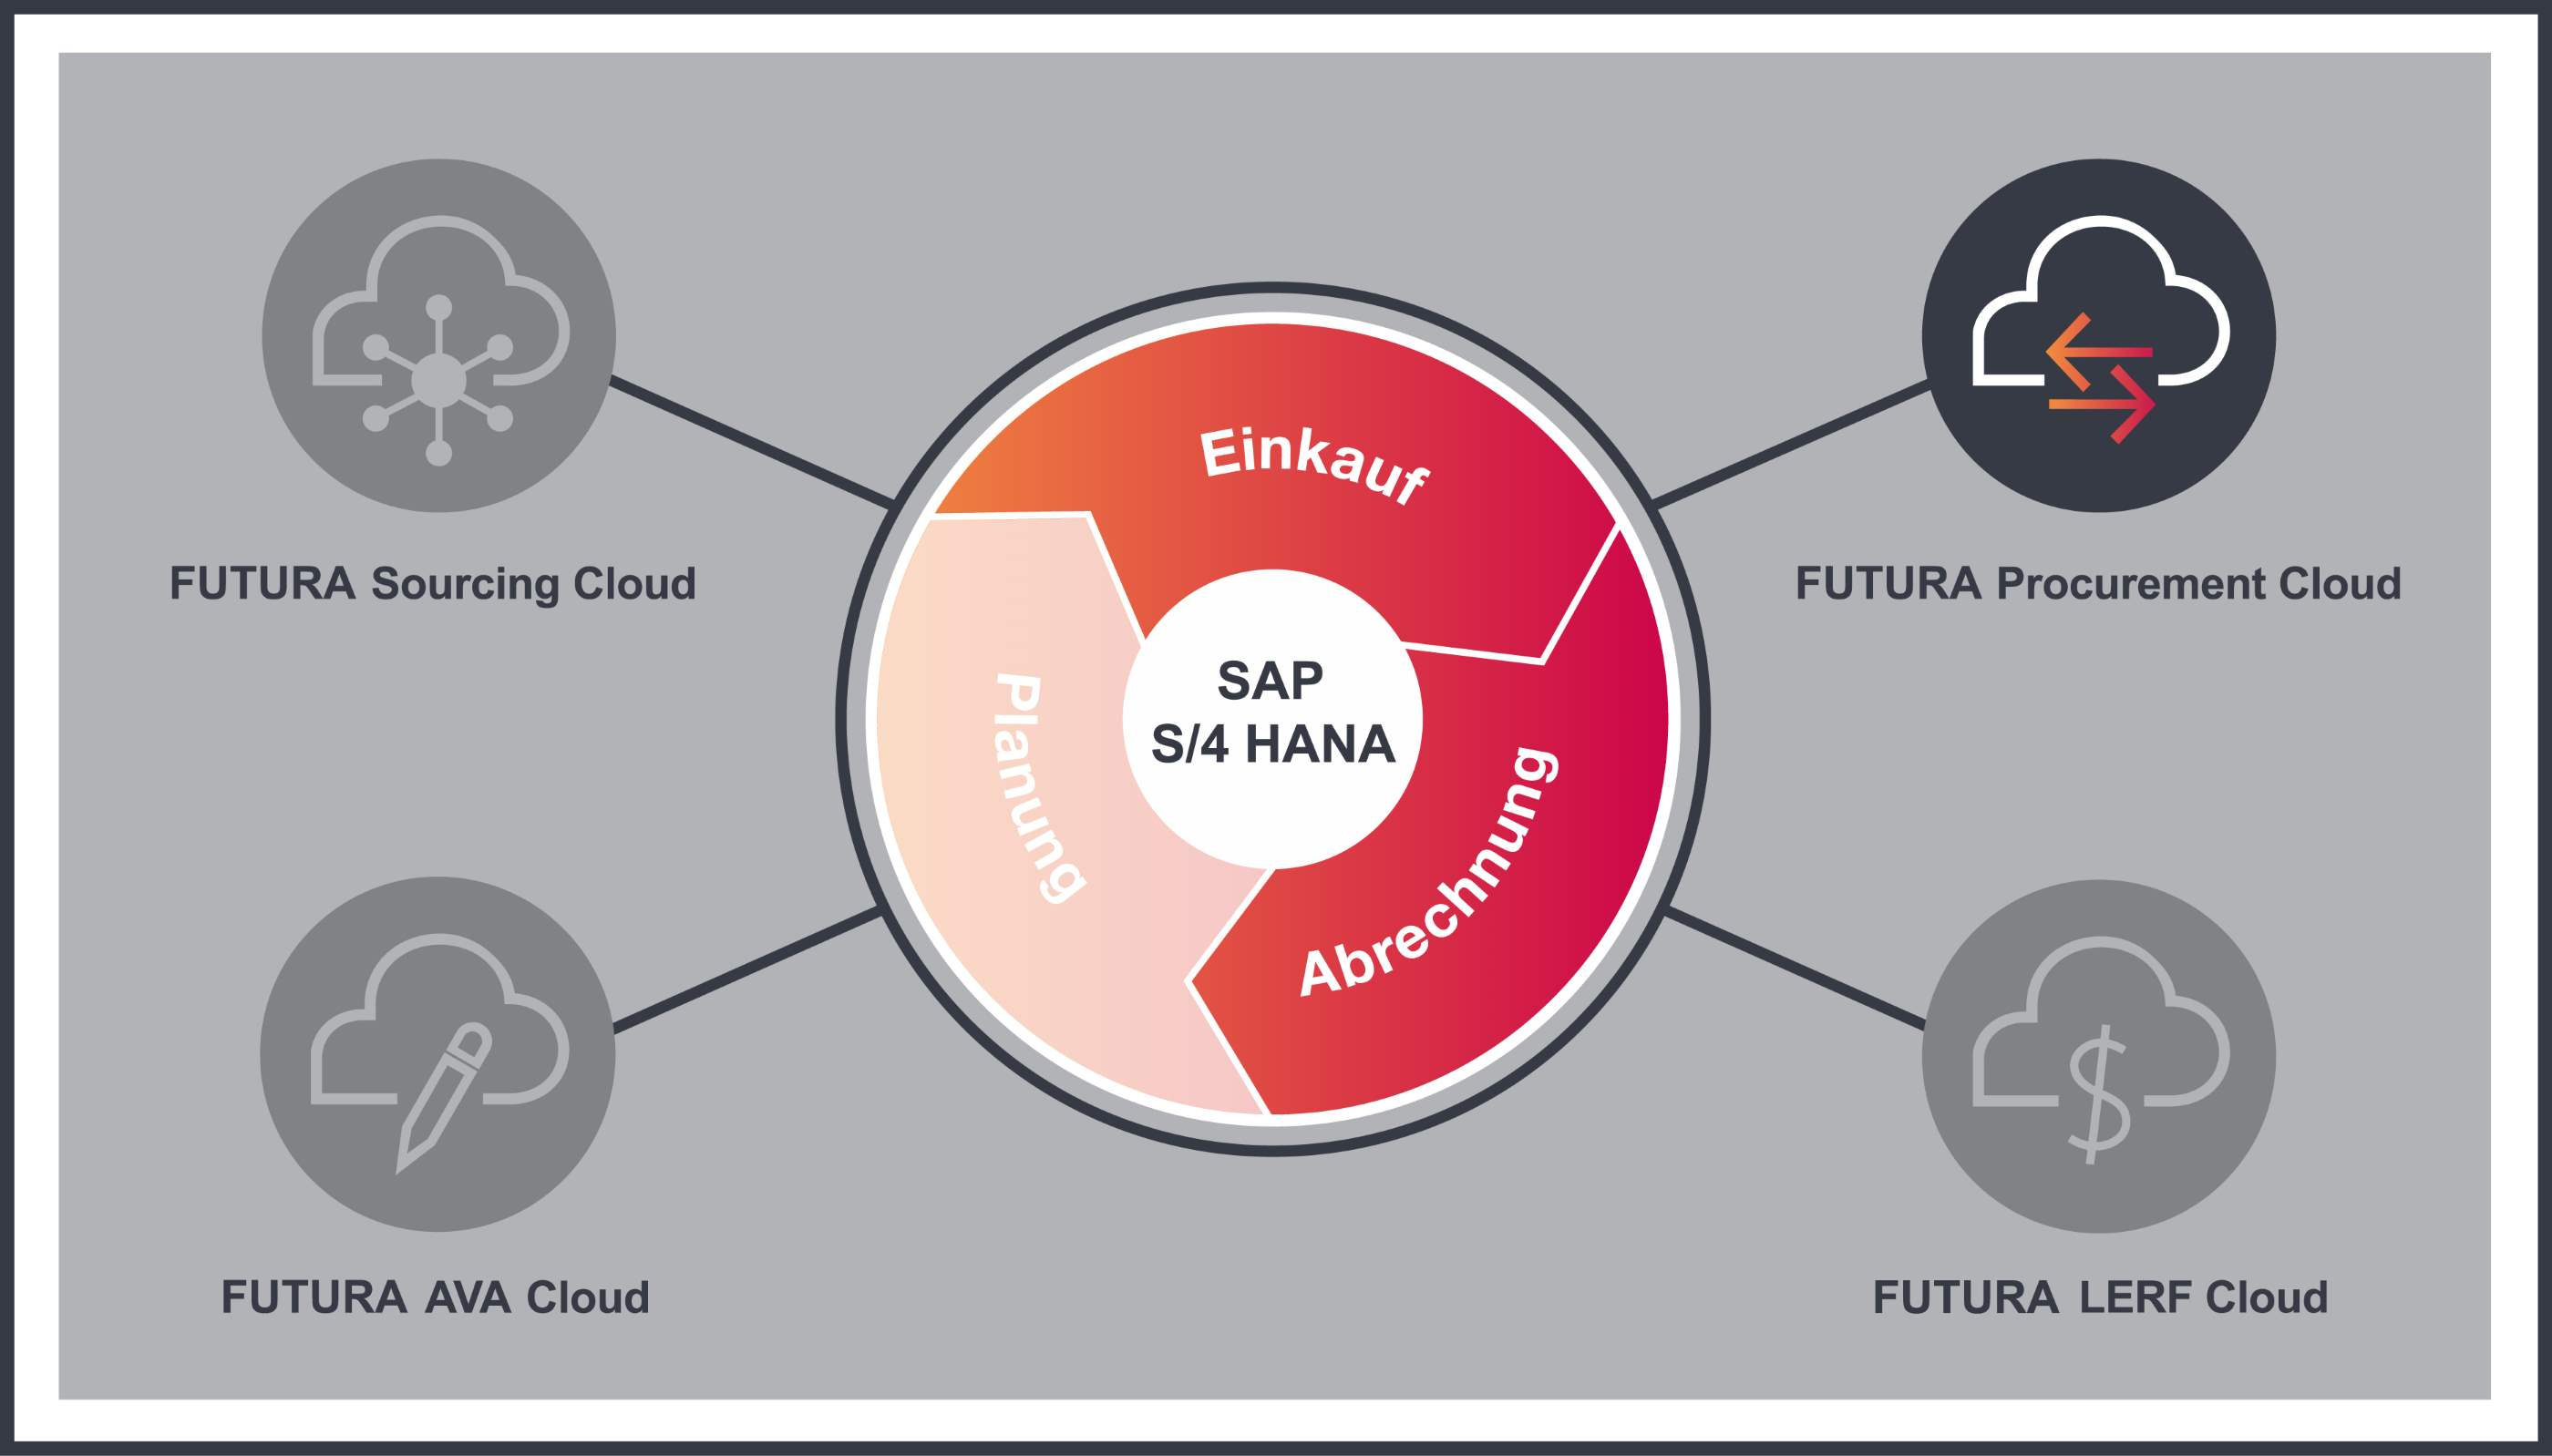 Kreislaufgrafik zur FUTURA Procurement Cloud